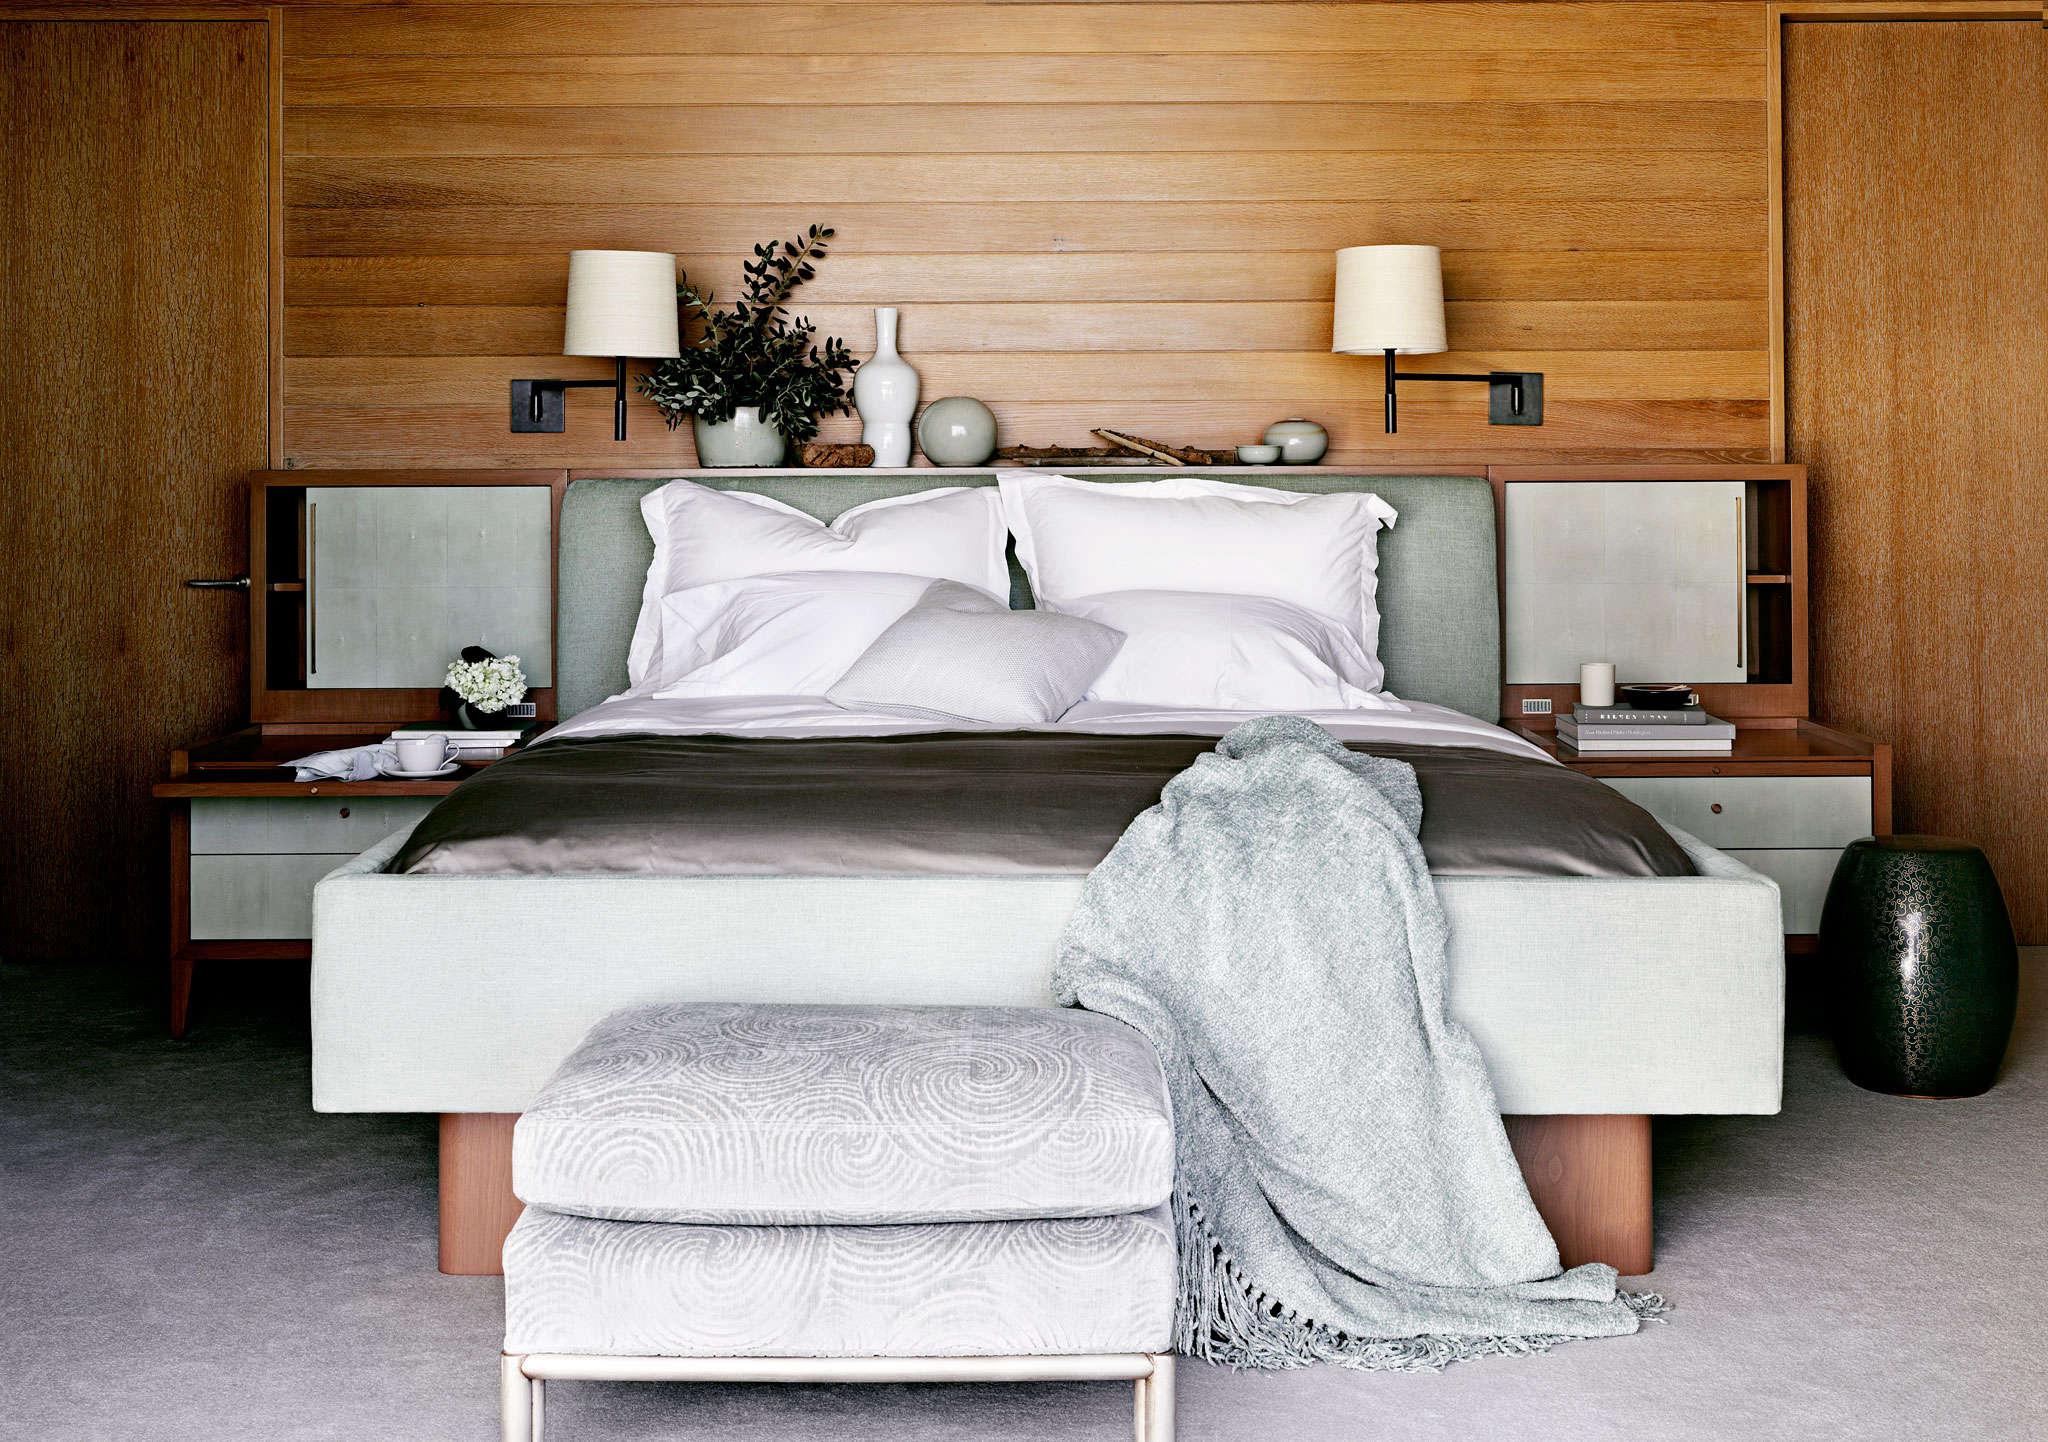 Wood paneled romantic bedroom designed by Barbara Barry   Remodelista